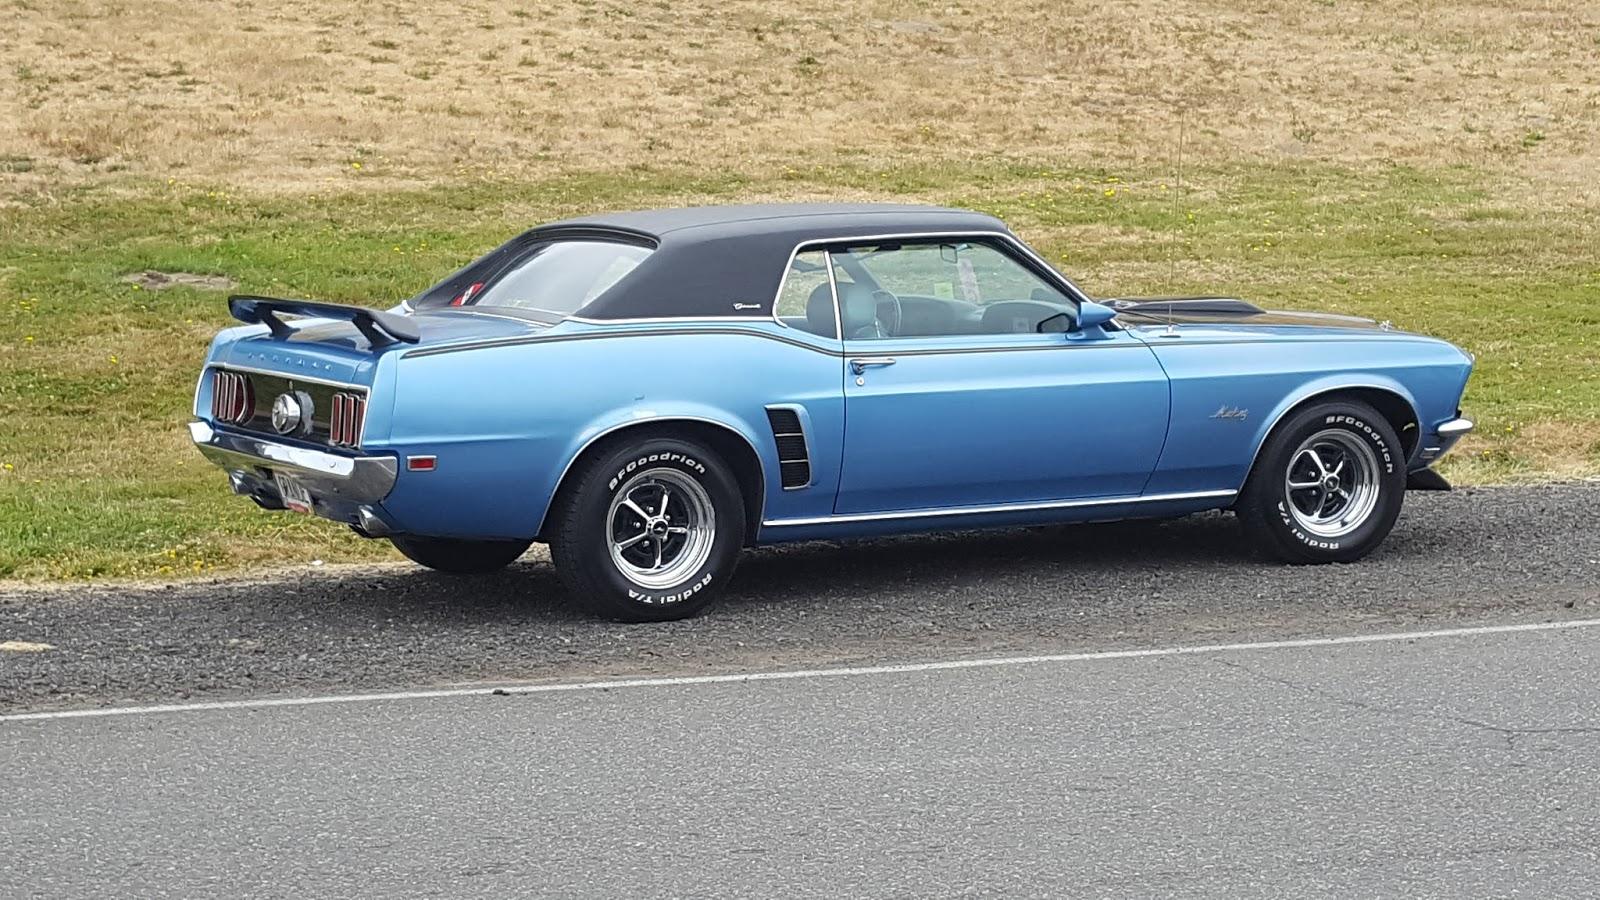 POPPA WHEELIE: '69 Mustang Coupe